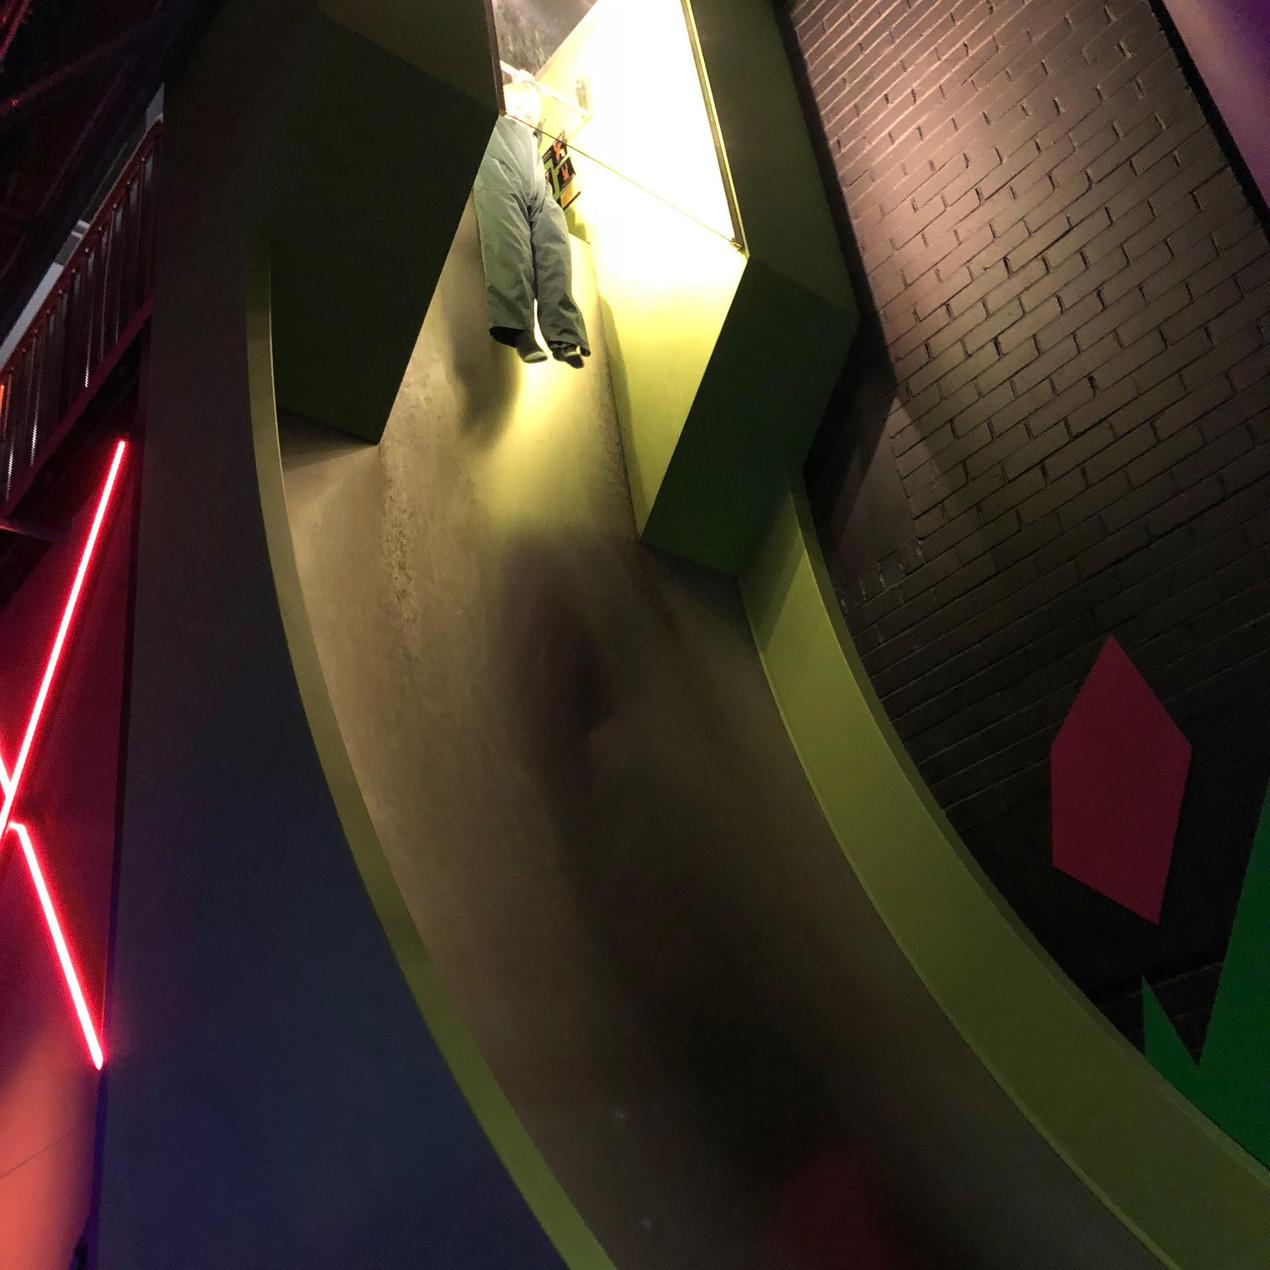 The Giant free fall slide